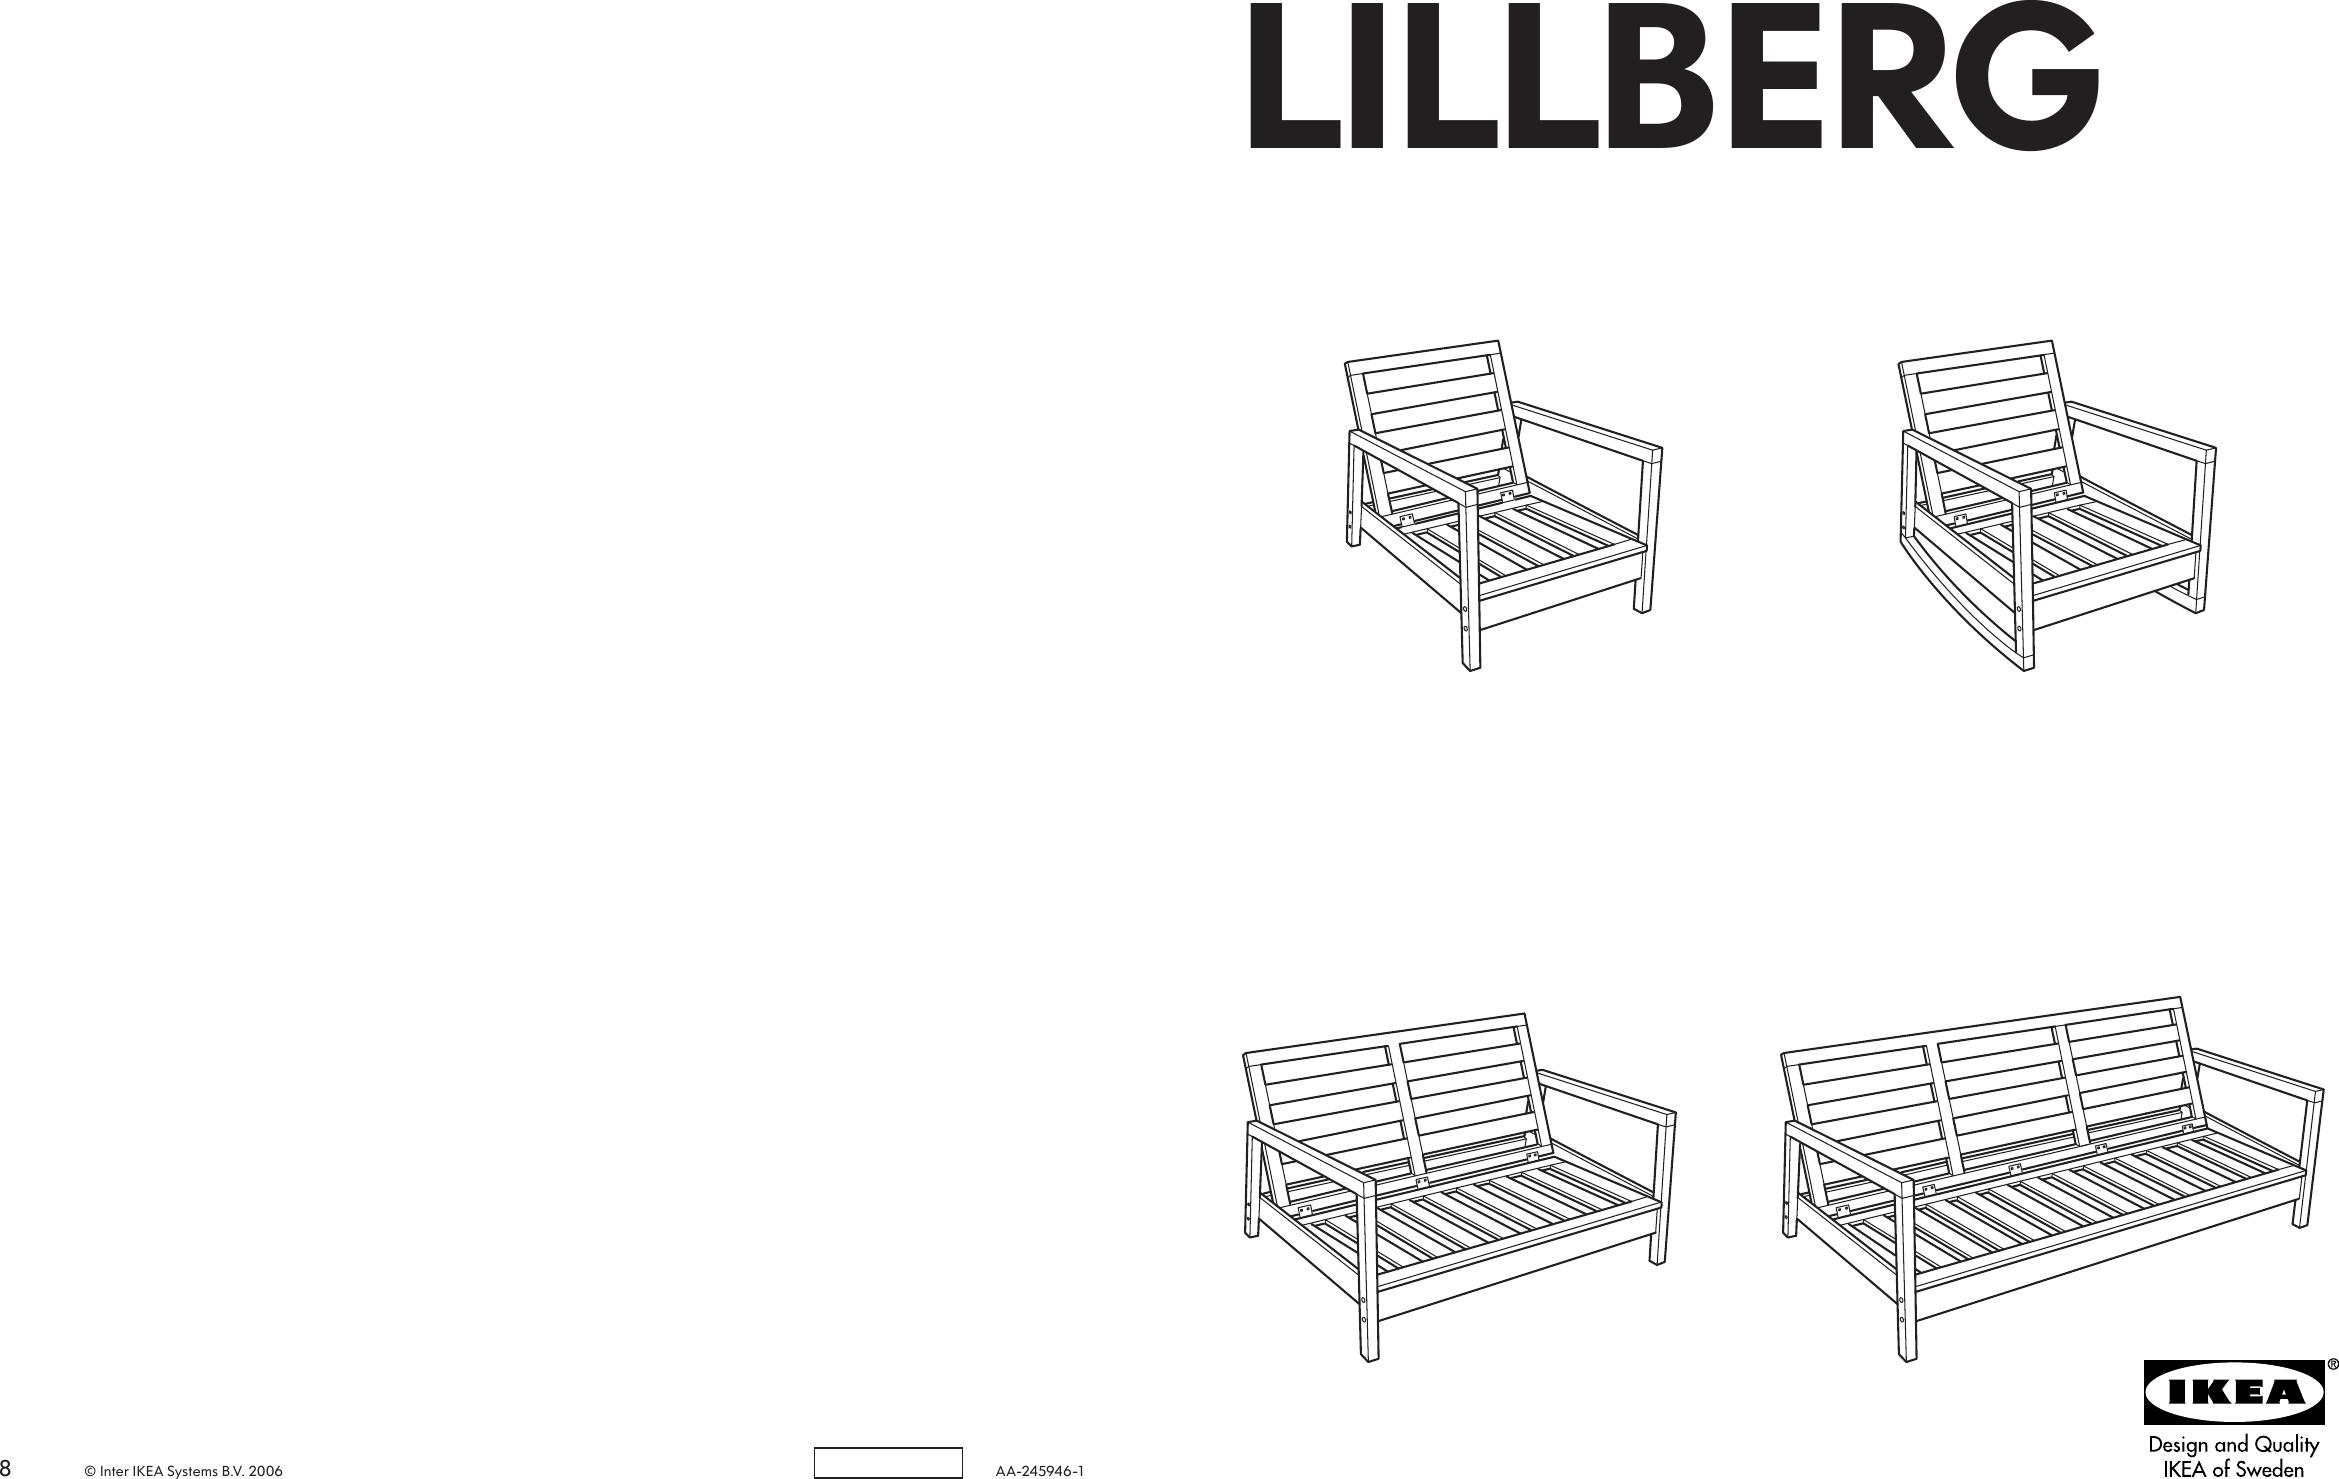 Wondrous Ikea Lillberg Rocking Chair Frame Assembly Instruction Theyellowbook Wood Chair Design Ideas Theyellowbookinfo